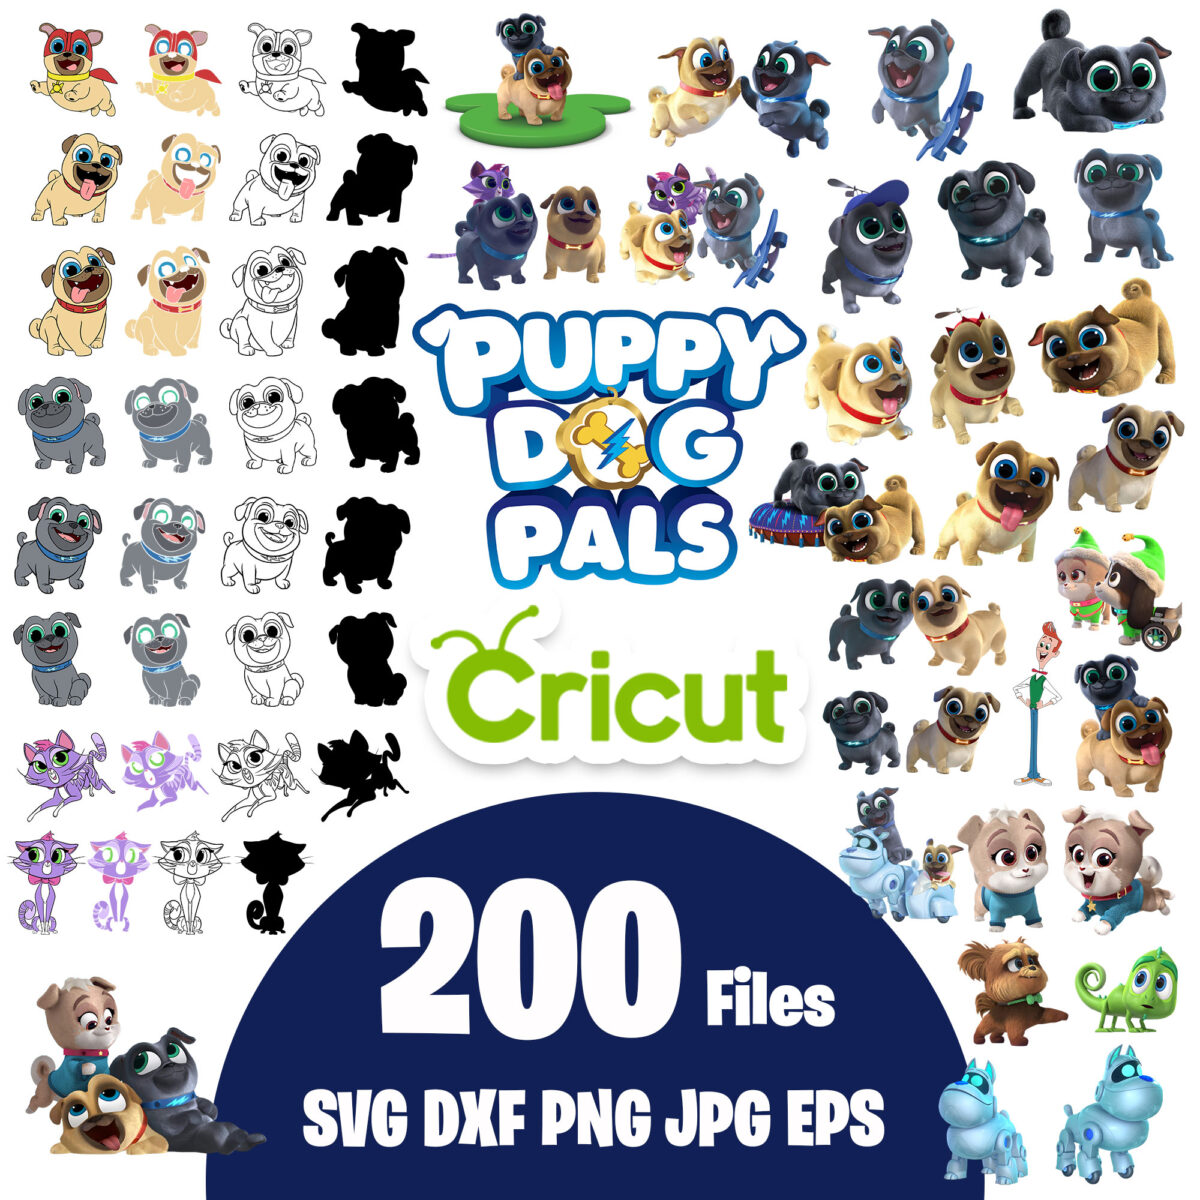 Puppy dog pals clipart